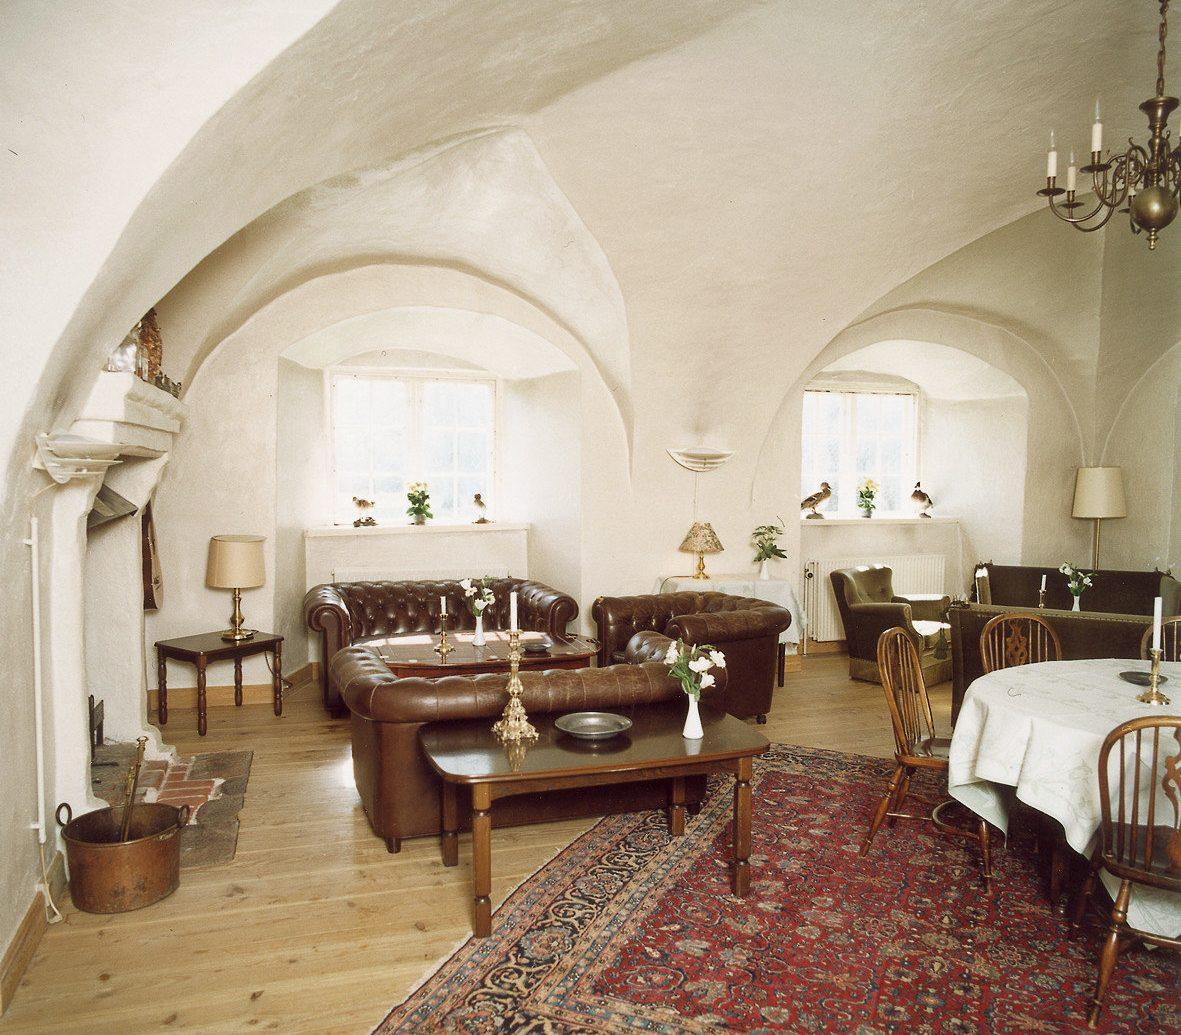 Denmark Finland Hotels Landmarks Luxury Travel Sweden indoor wall floor room ceiling interior design living room Suite furniture flooring estate table arch area several